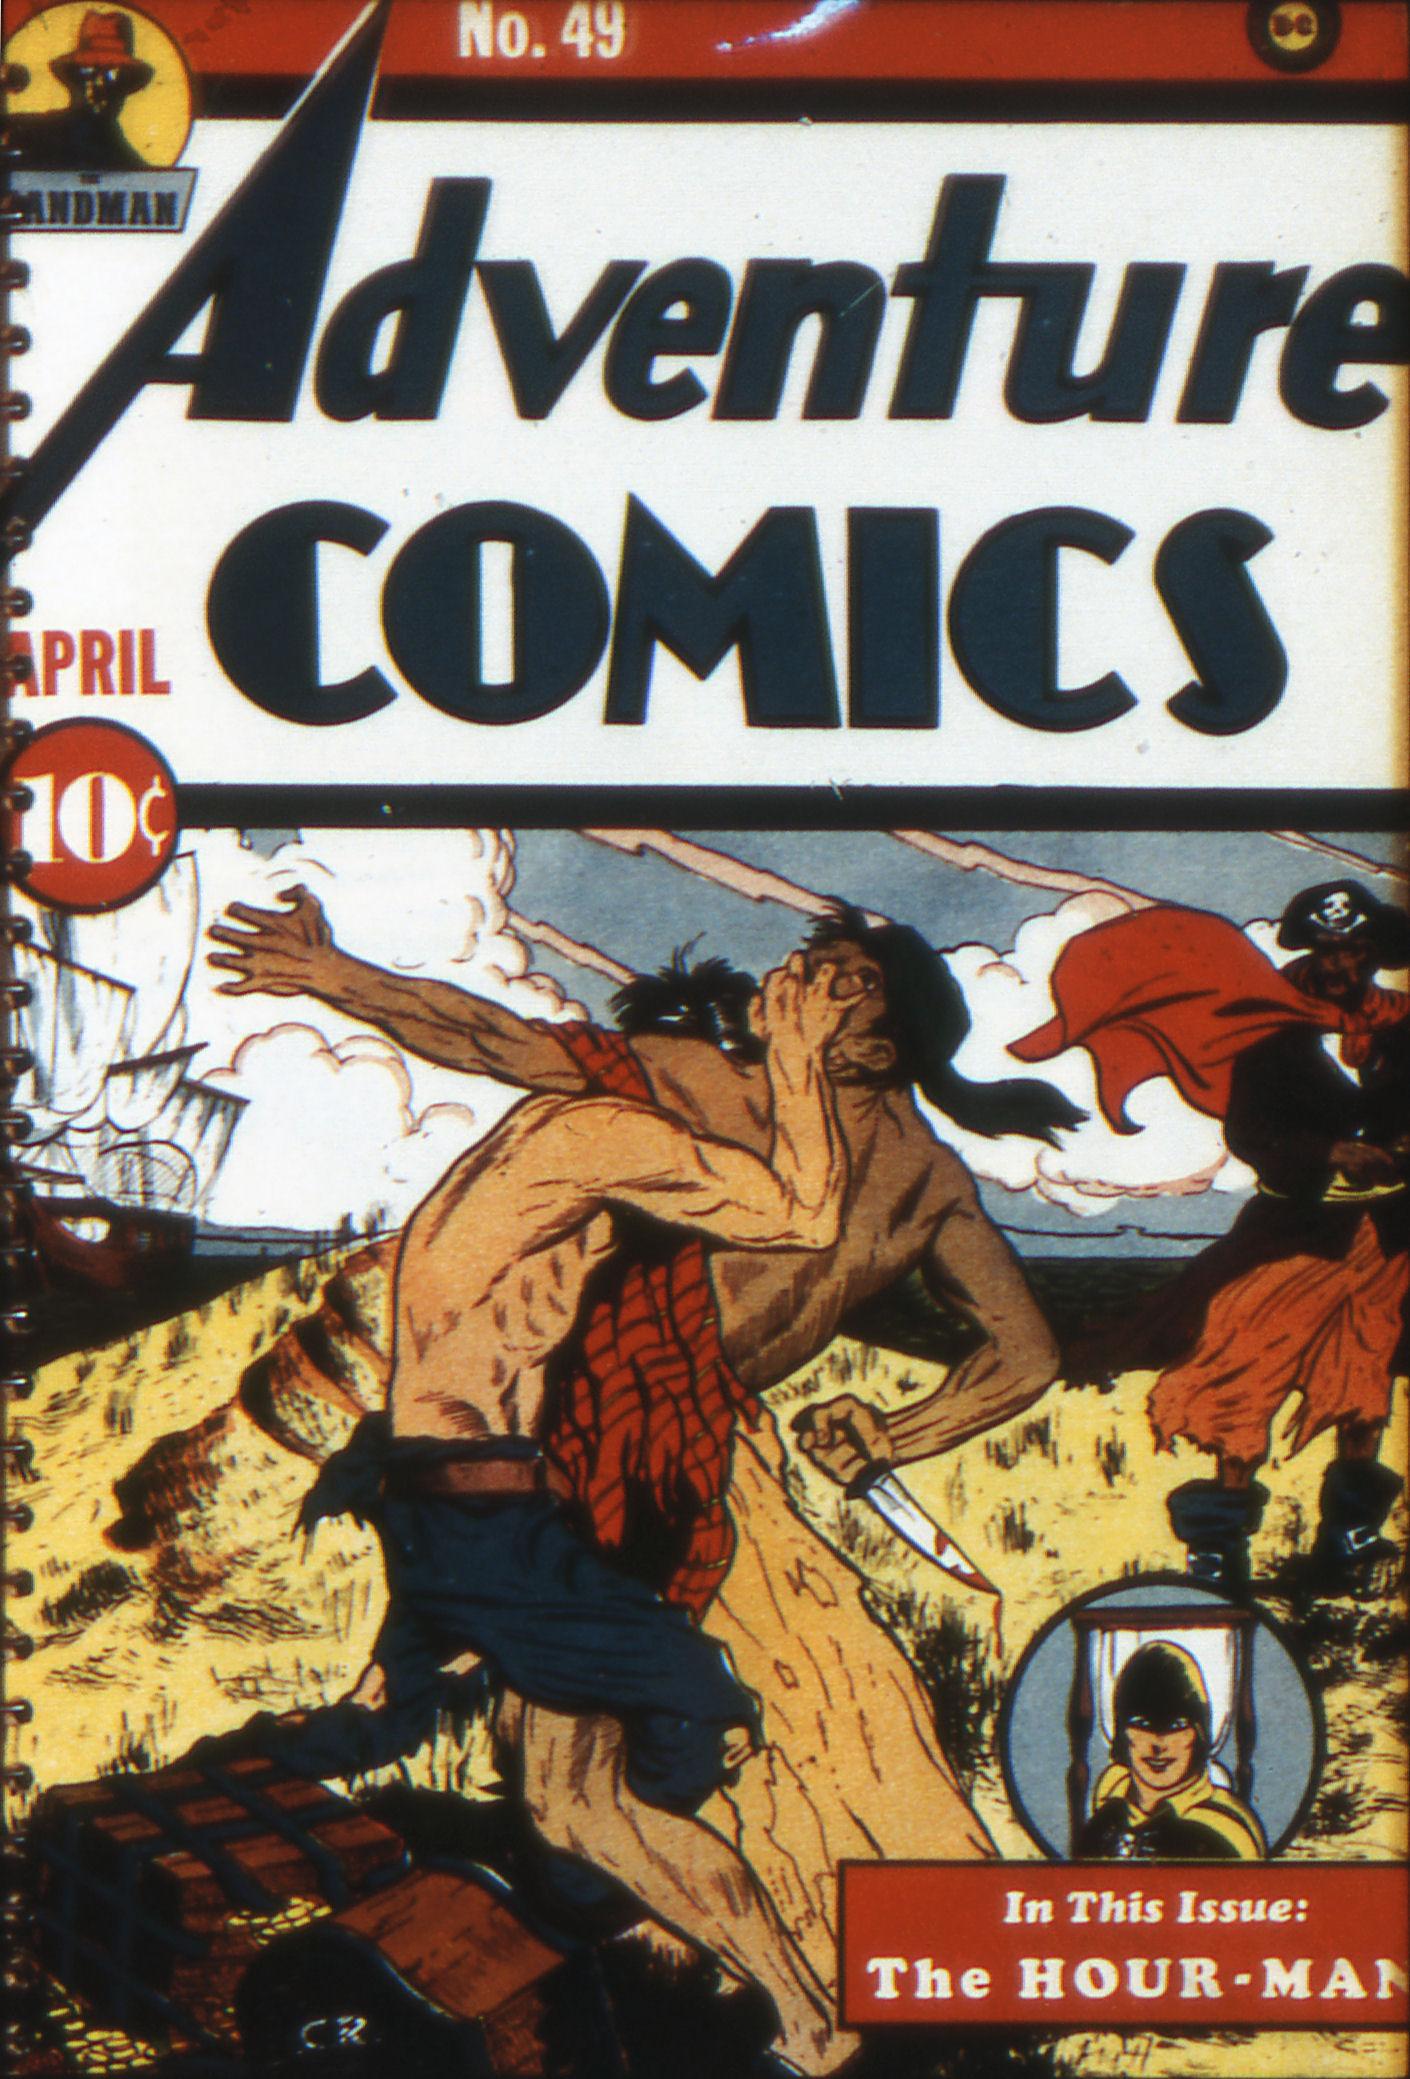 Read online Adventure Comics (1938) comic -  Issue #49 - 1